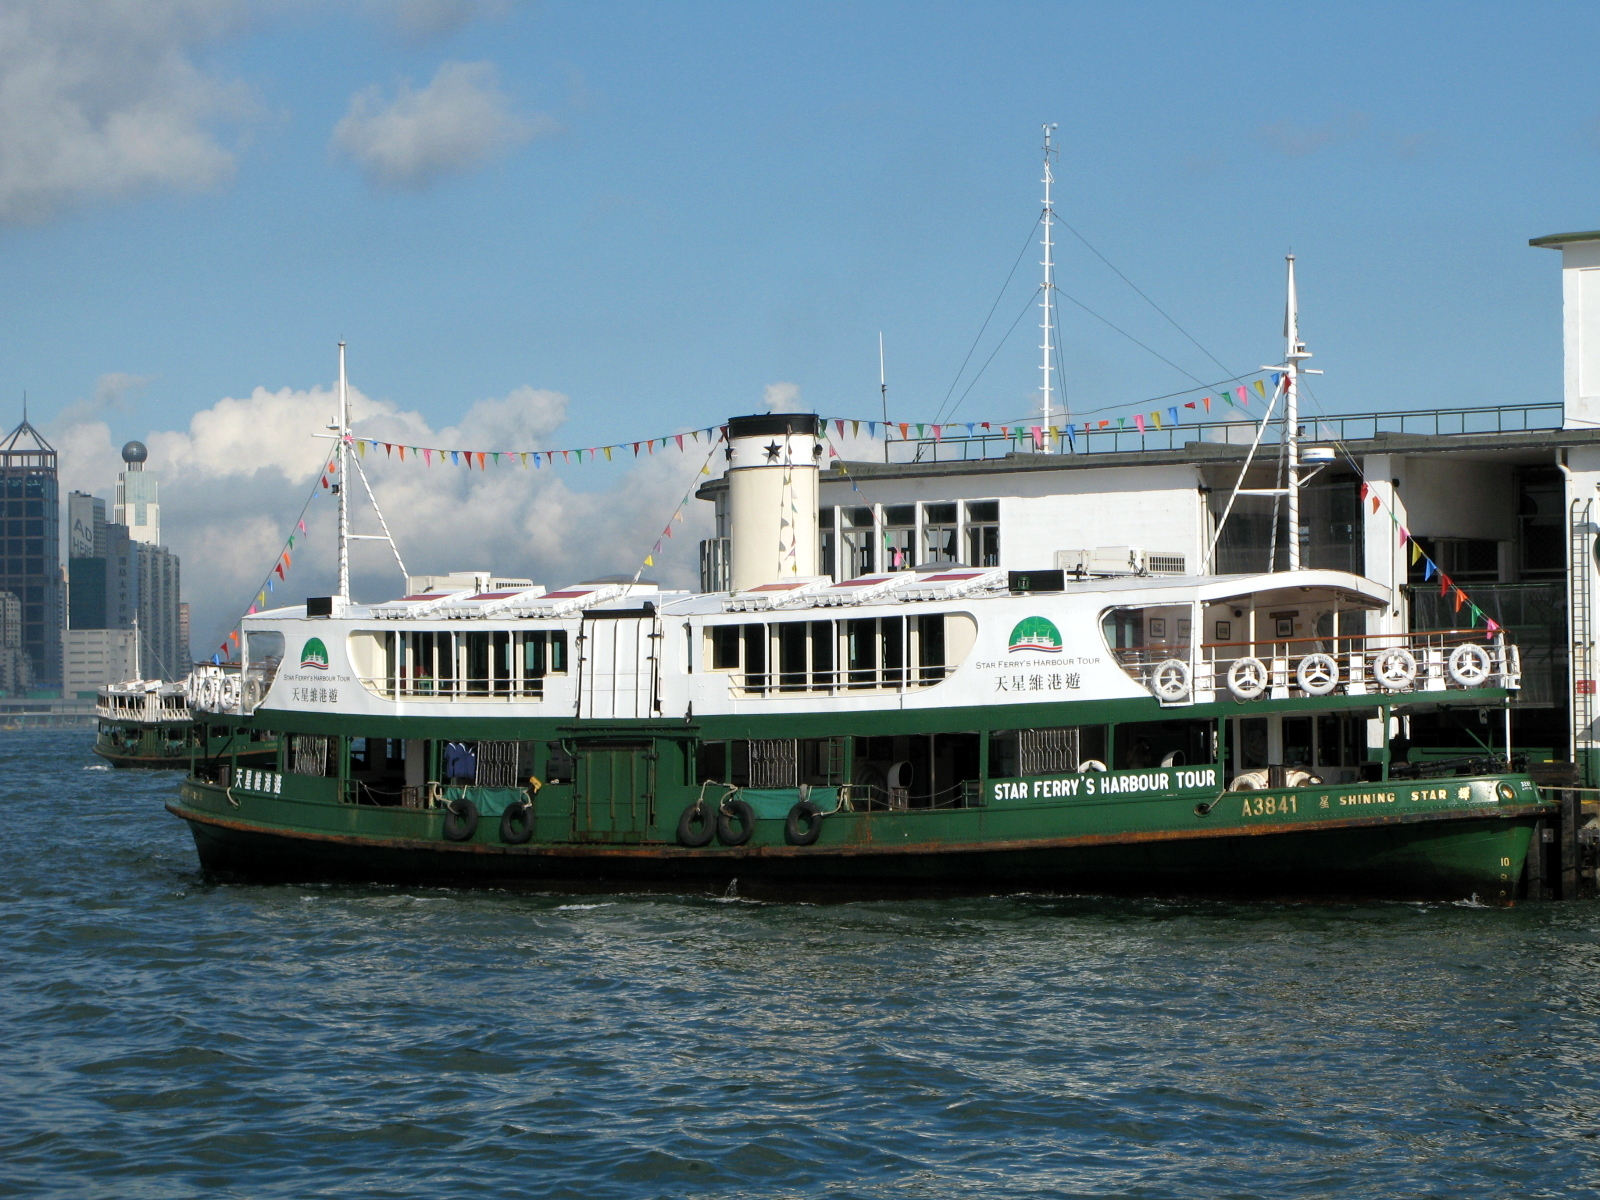 File:HK Star Ferry Harbour Tour Ship.jpg - Wikimedia Commons